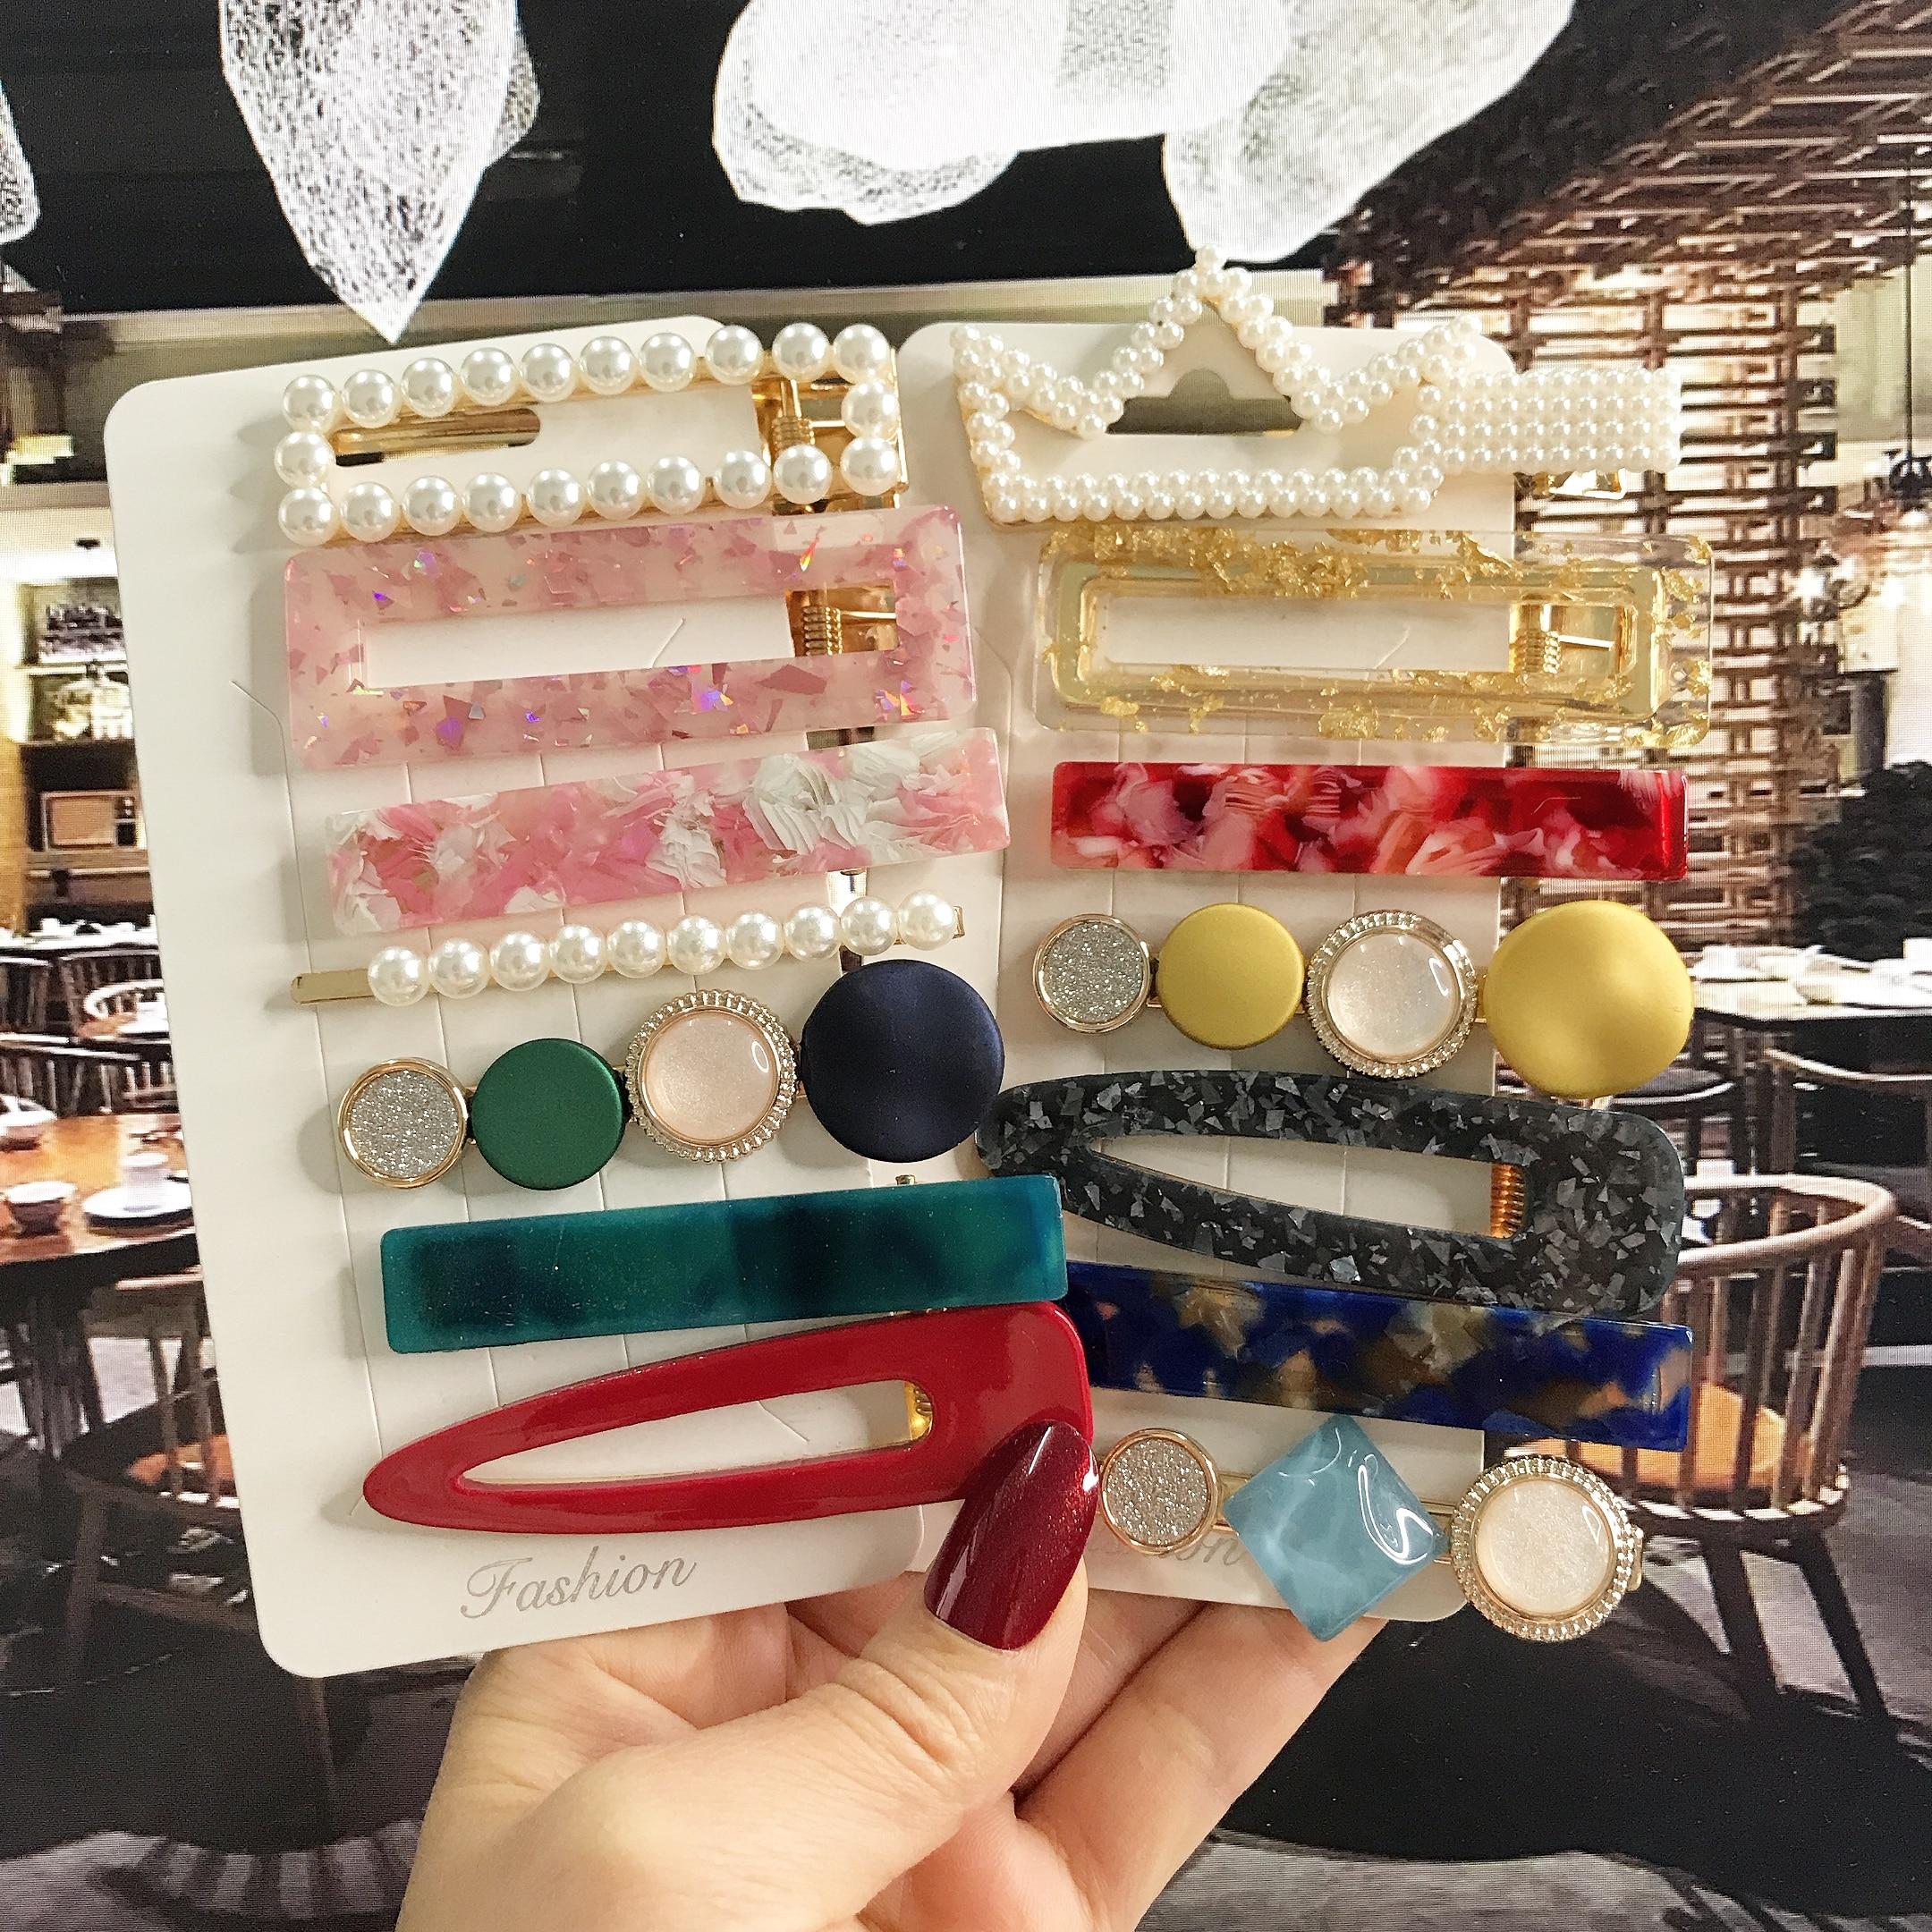 Korean Fashion Acrylic Barrette For Women Vintage Geometric BB Hairpins Clips Set Simulated Pearl Girl Hair Accessories Hairgrip